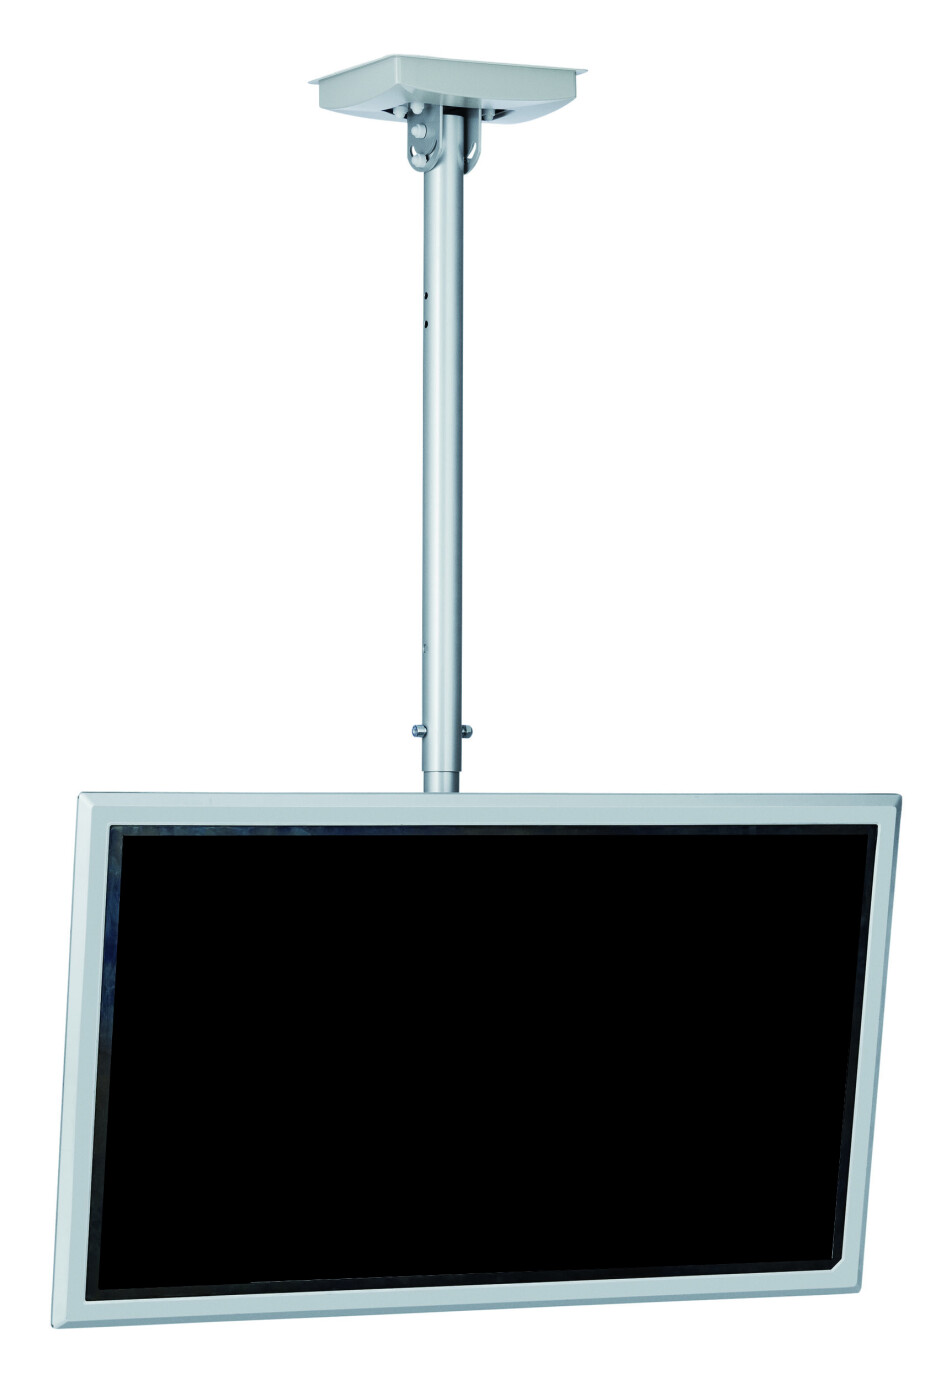 Func Flatscreen soporte de techo CH VST2 negro